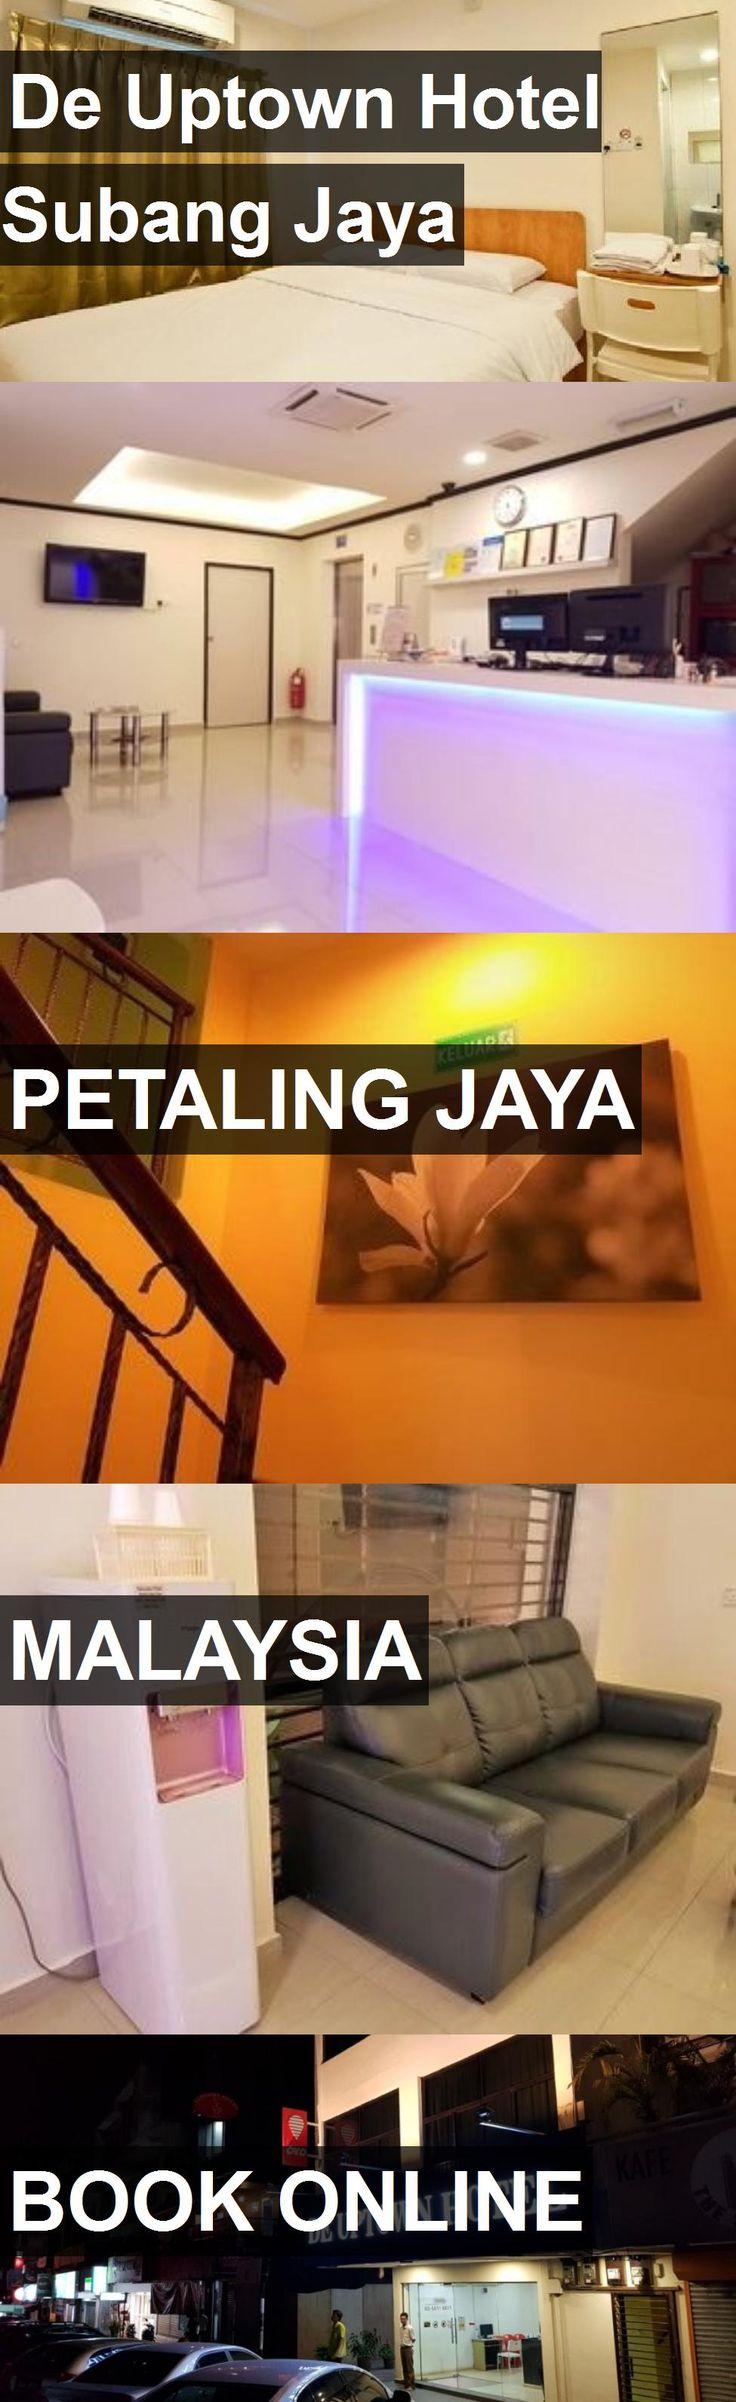 De Uptown Hotel Subang Jaya in Petaling Jaya, Malaysia. For more information, photos, reviews and best prices please follow the link. #Malaysia #PetalingJaya #travel #vacation #hotel